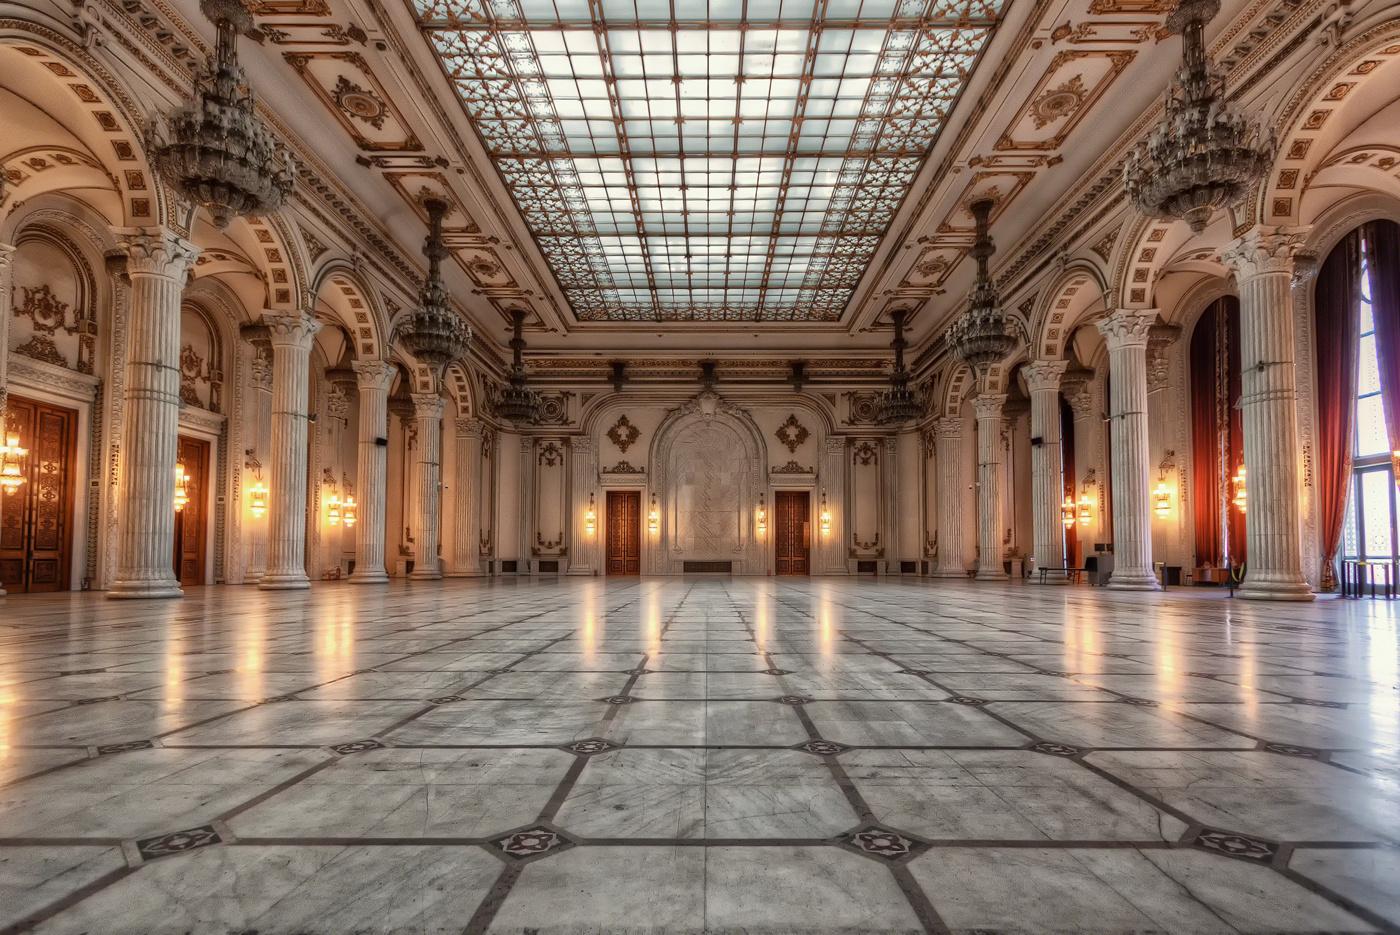 Bucharest's Palace of the Parliament - Ballroom | Romania by Nico Trinkhaus